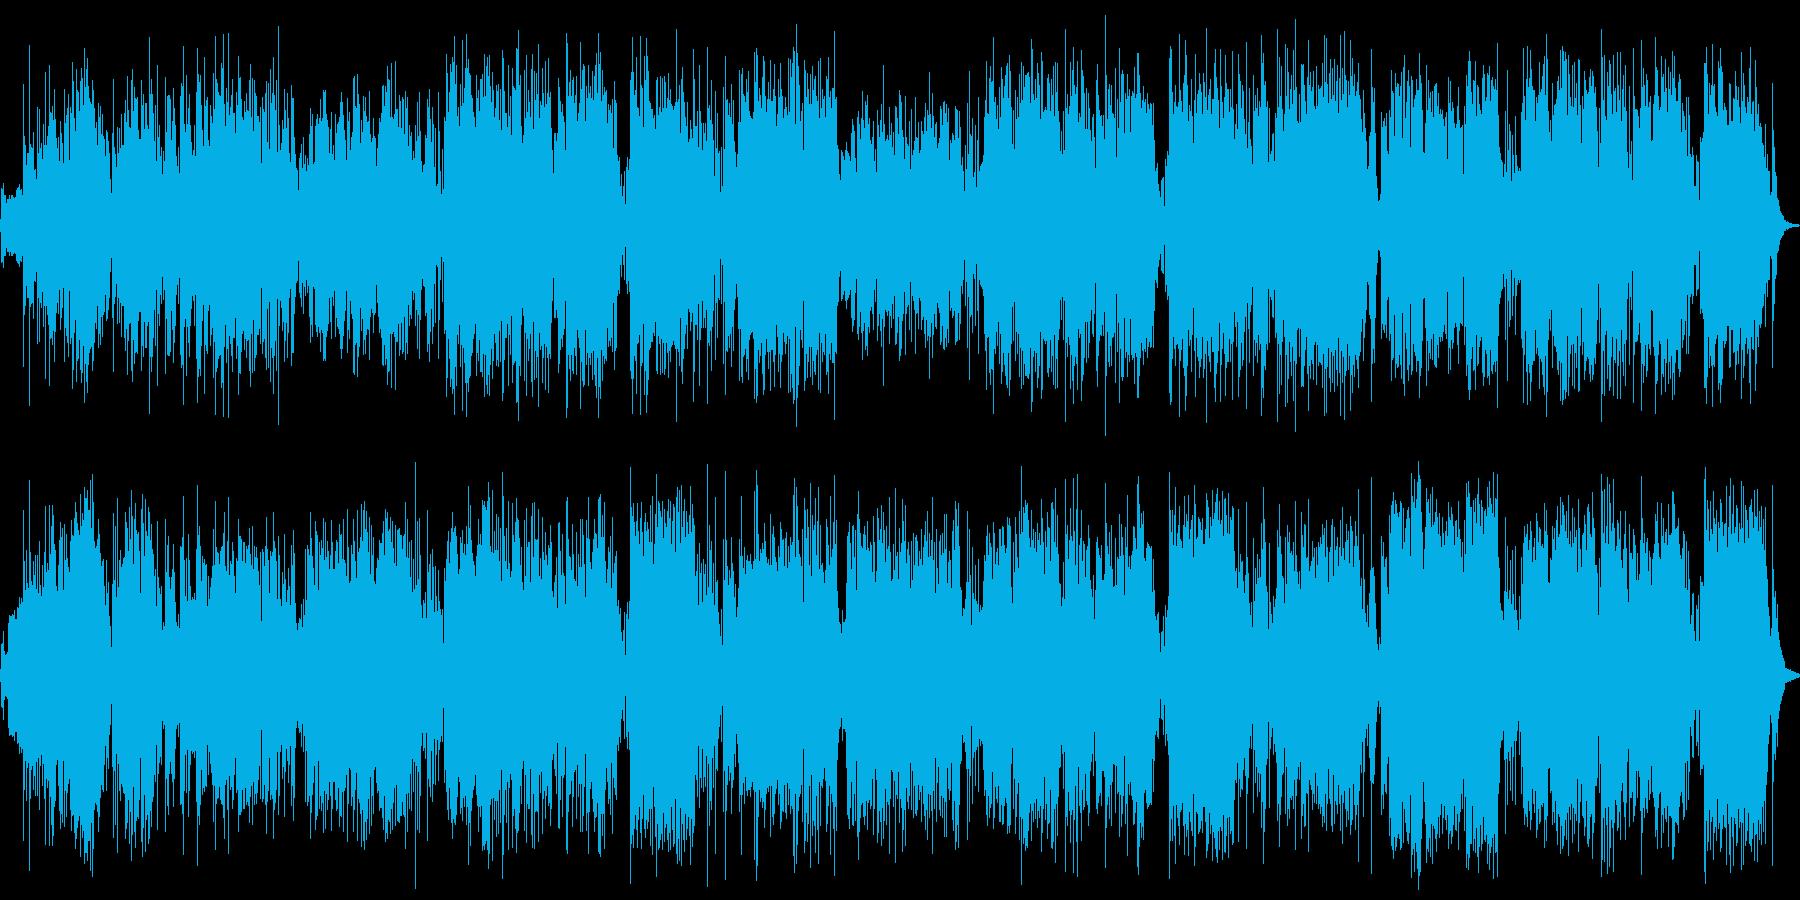 bossa nova ボサノバの再生済みの波形